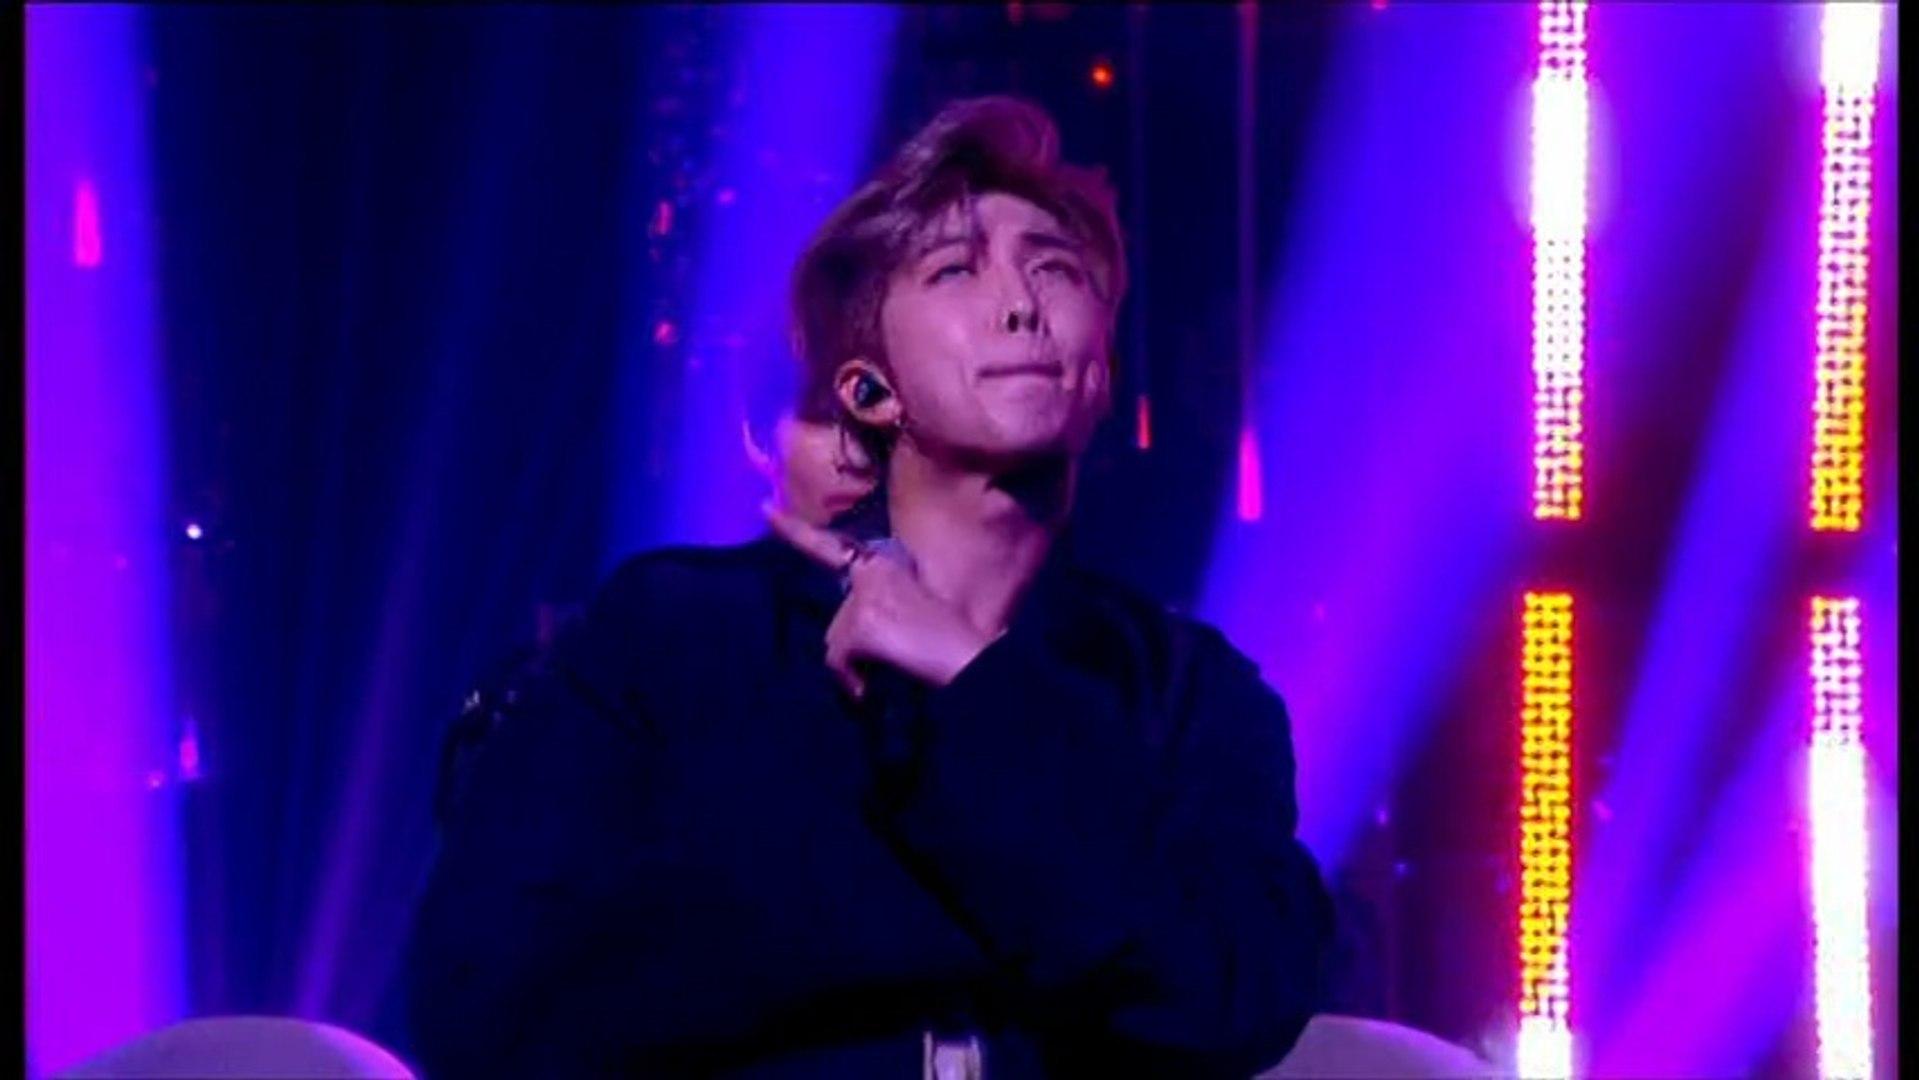 The Graham Norton Show - S24E03 - BTS, Whoopi Goldberg, Jamie Dornan, Rosamund Pike and Harry Connic